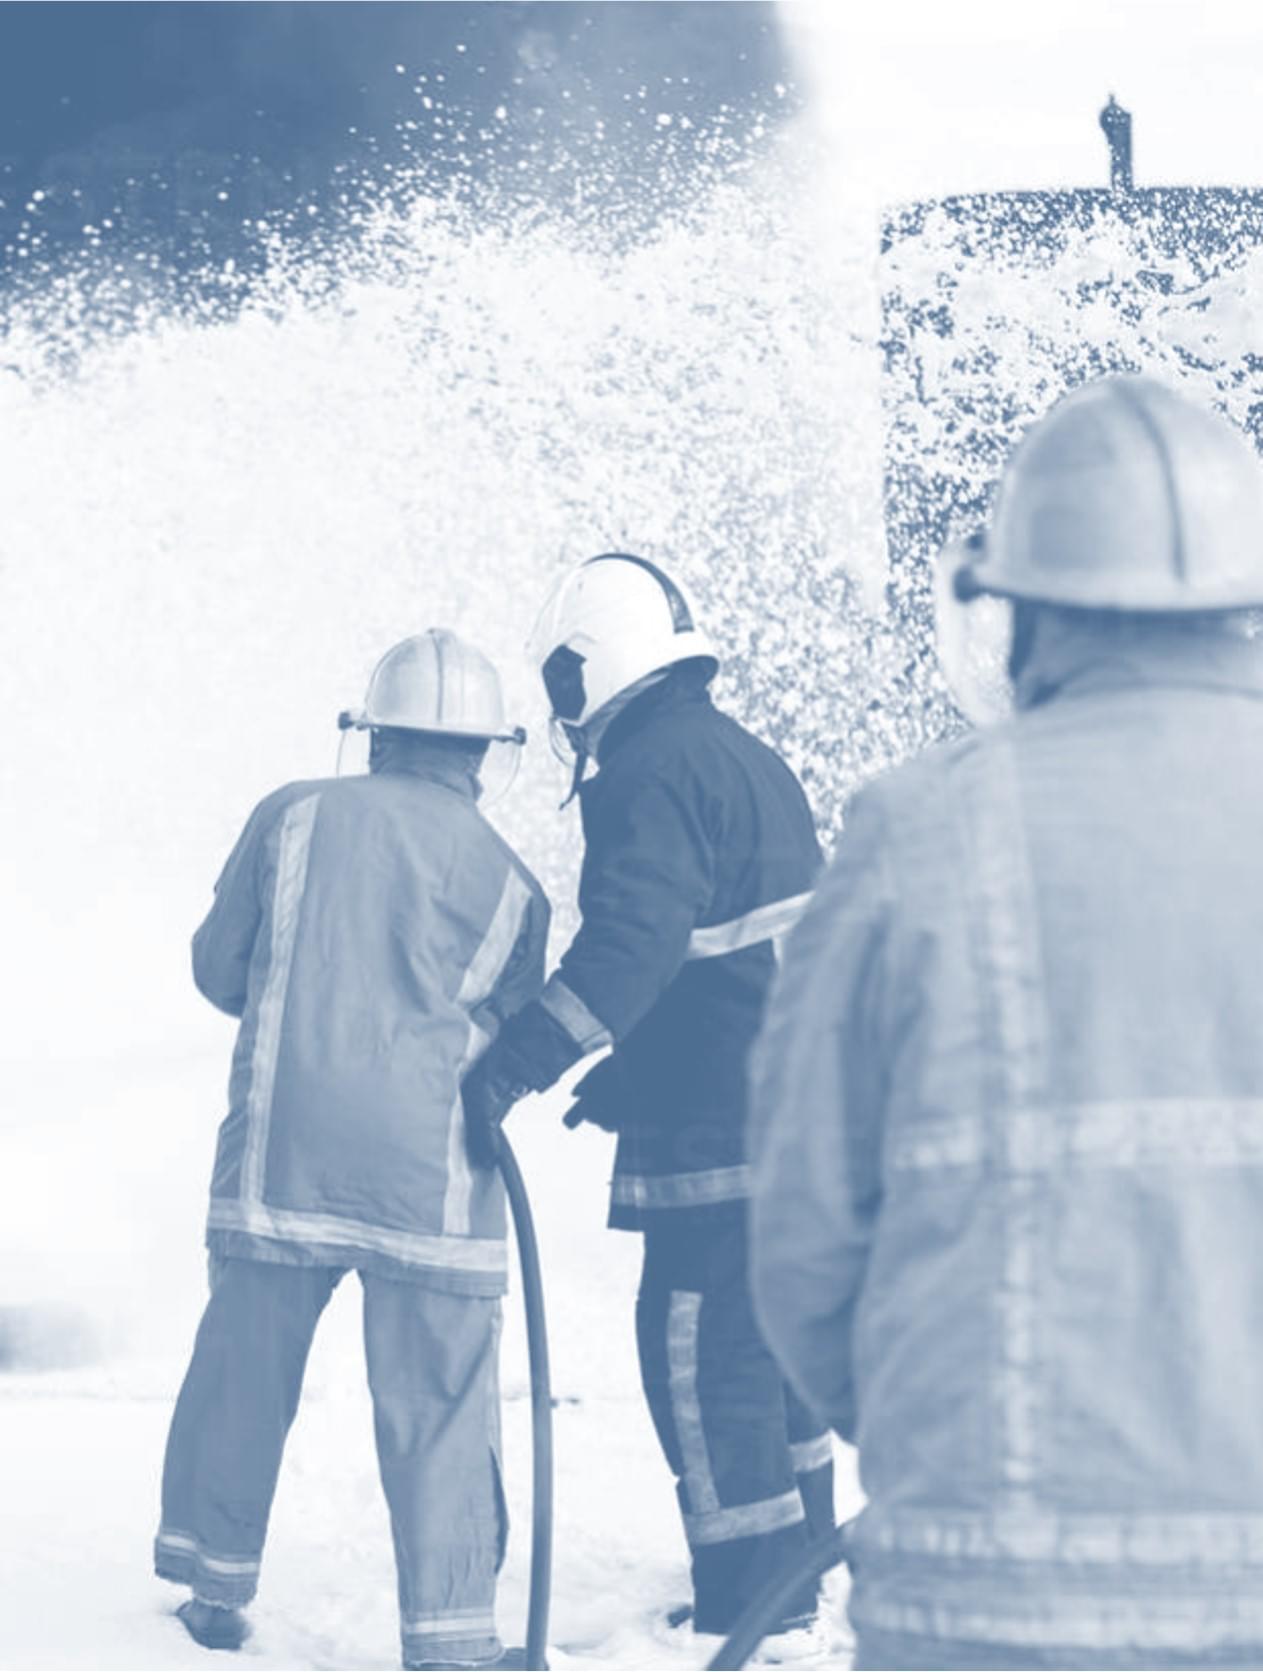 firemen training team spraying firefighting foam